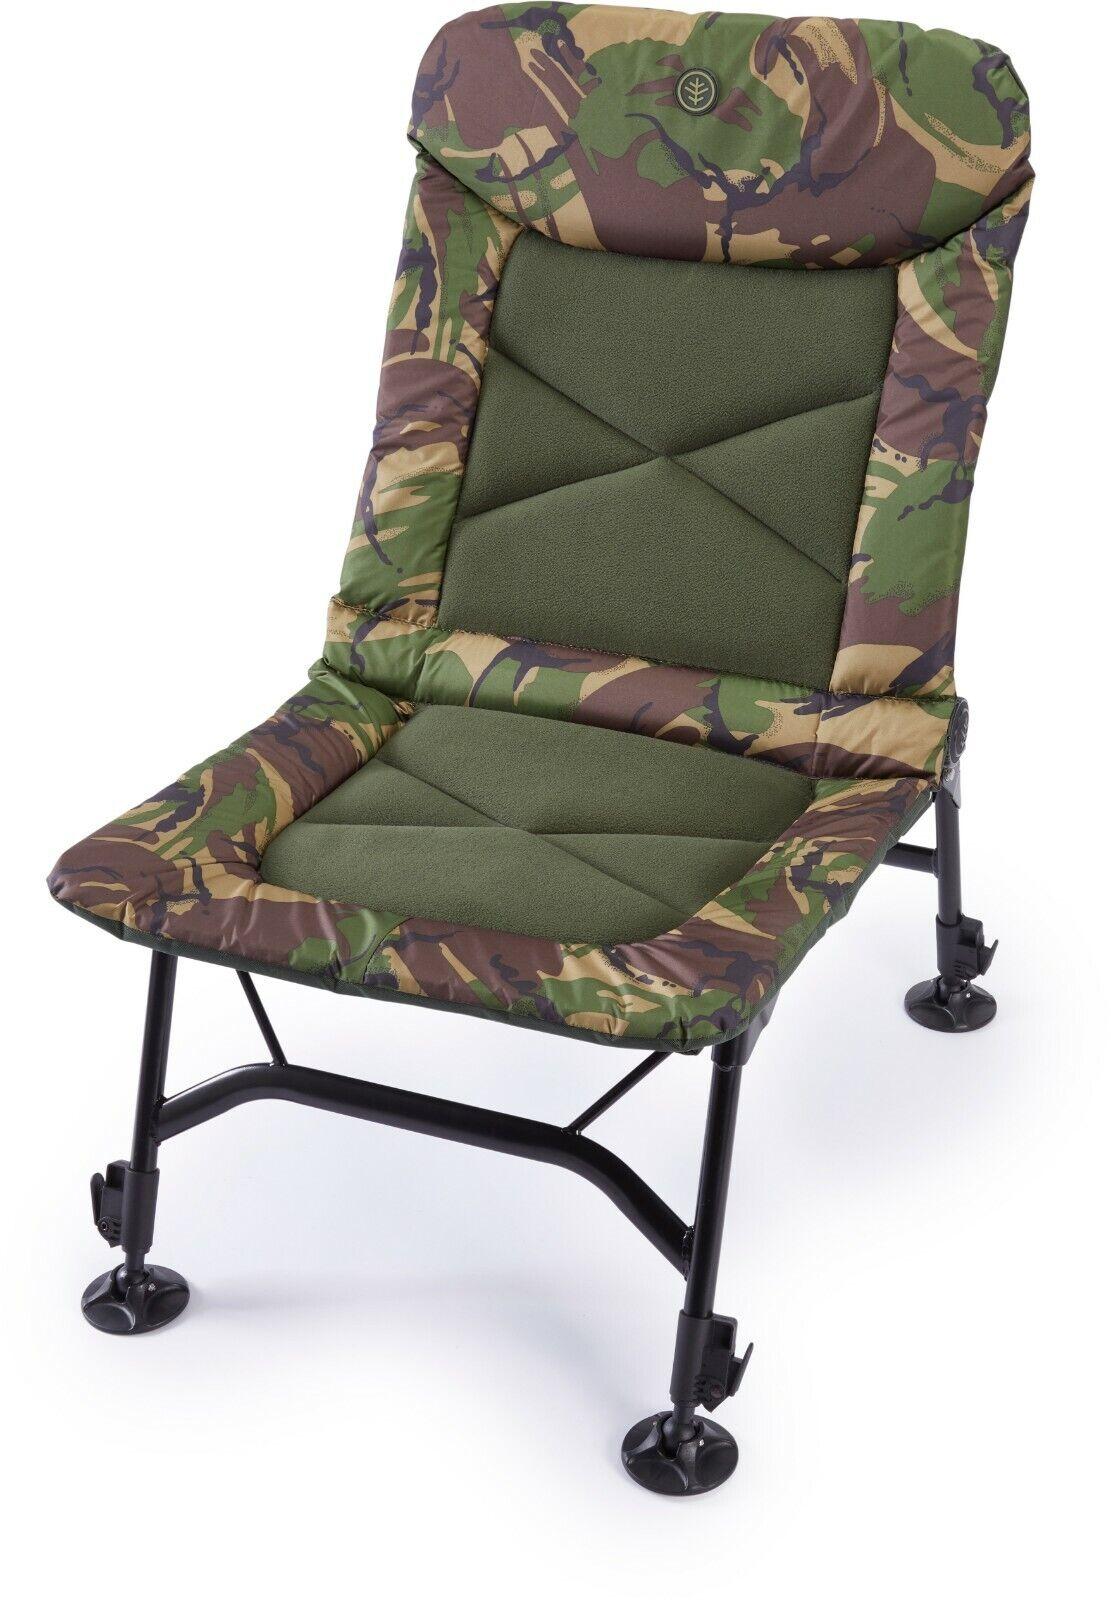 Wychwood Tattico x Chair Tutti i Modelli Nuovo, per Carpfishing Chair